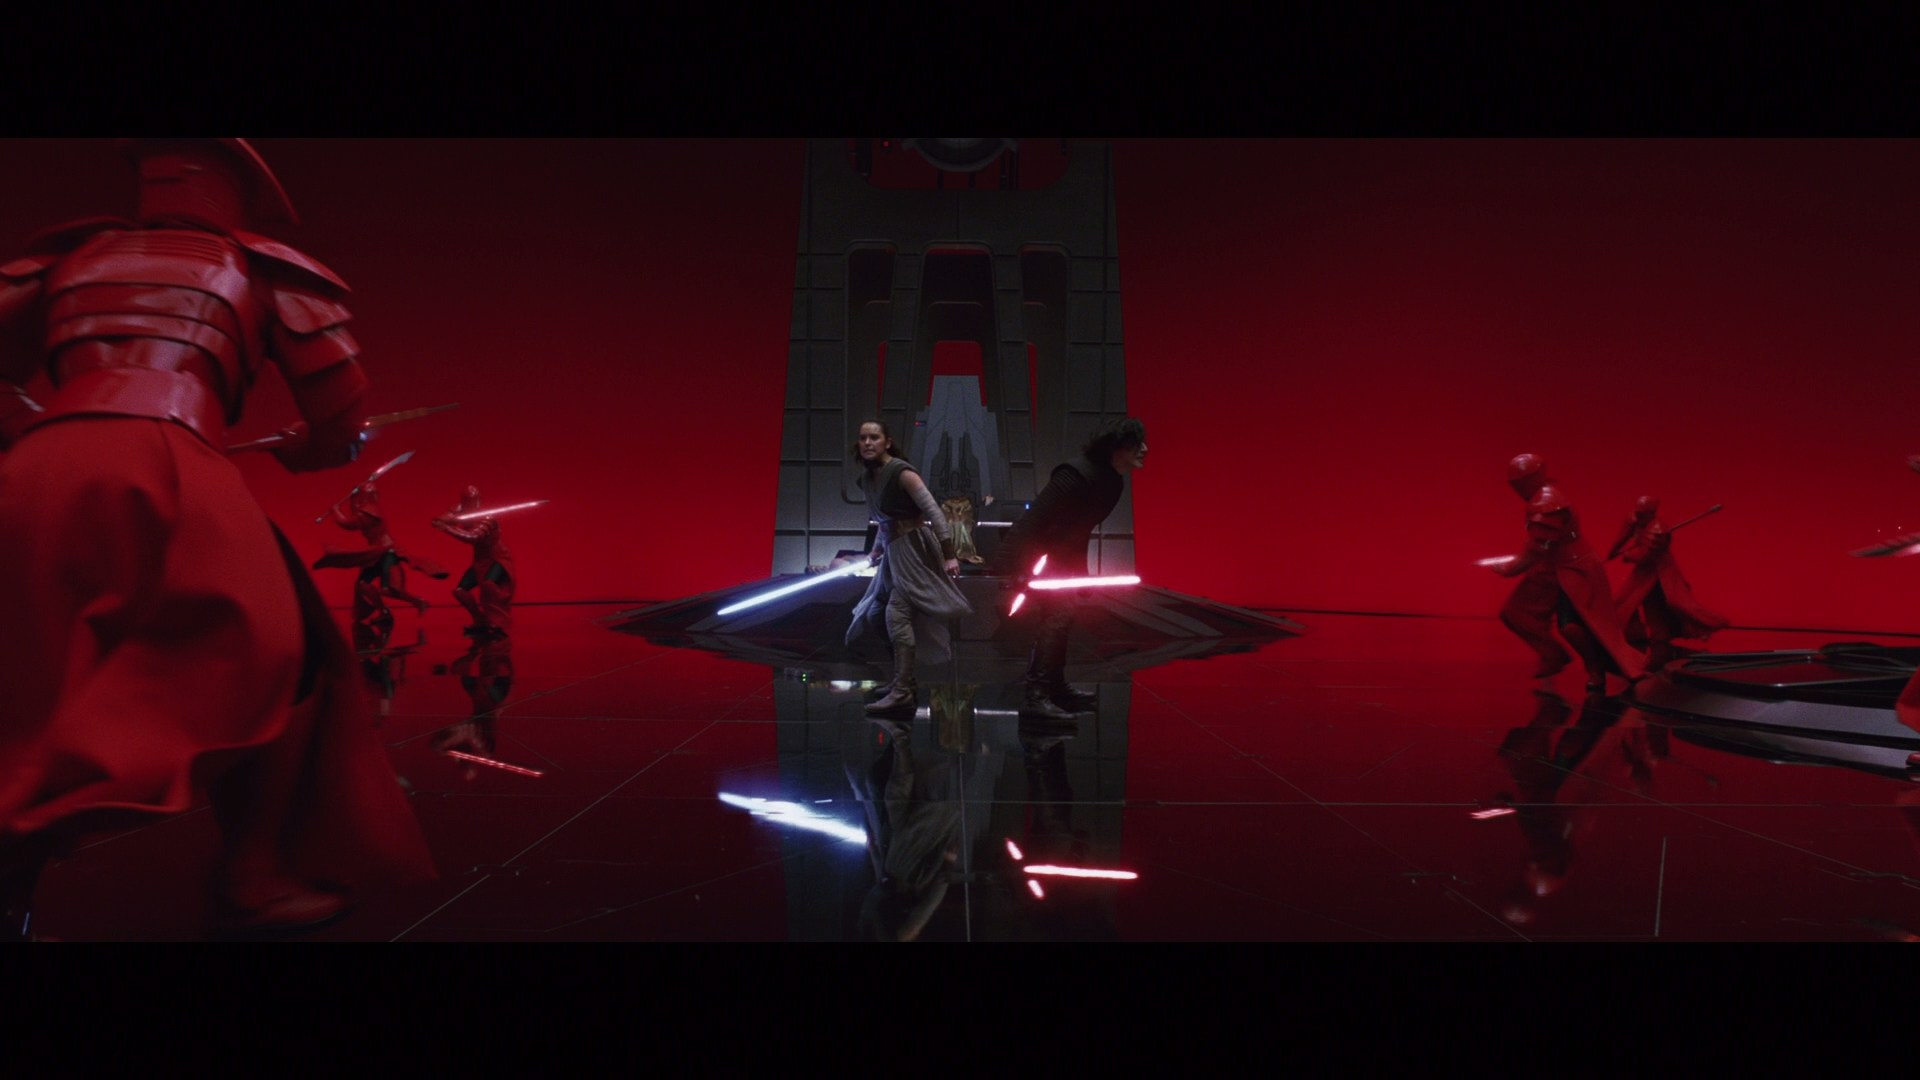 Ultima Sala Del Trono Jedi Fondo De Pantalla De La Sala De Star Wars 1920x1080 Wallpapertip